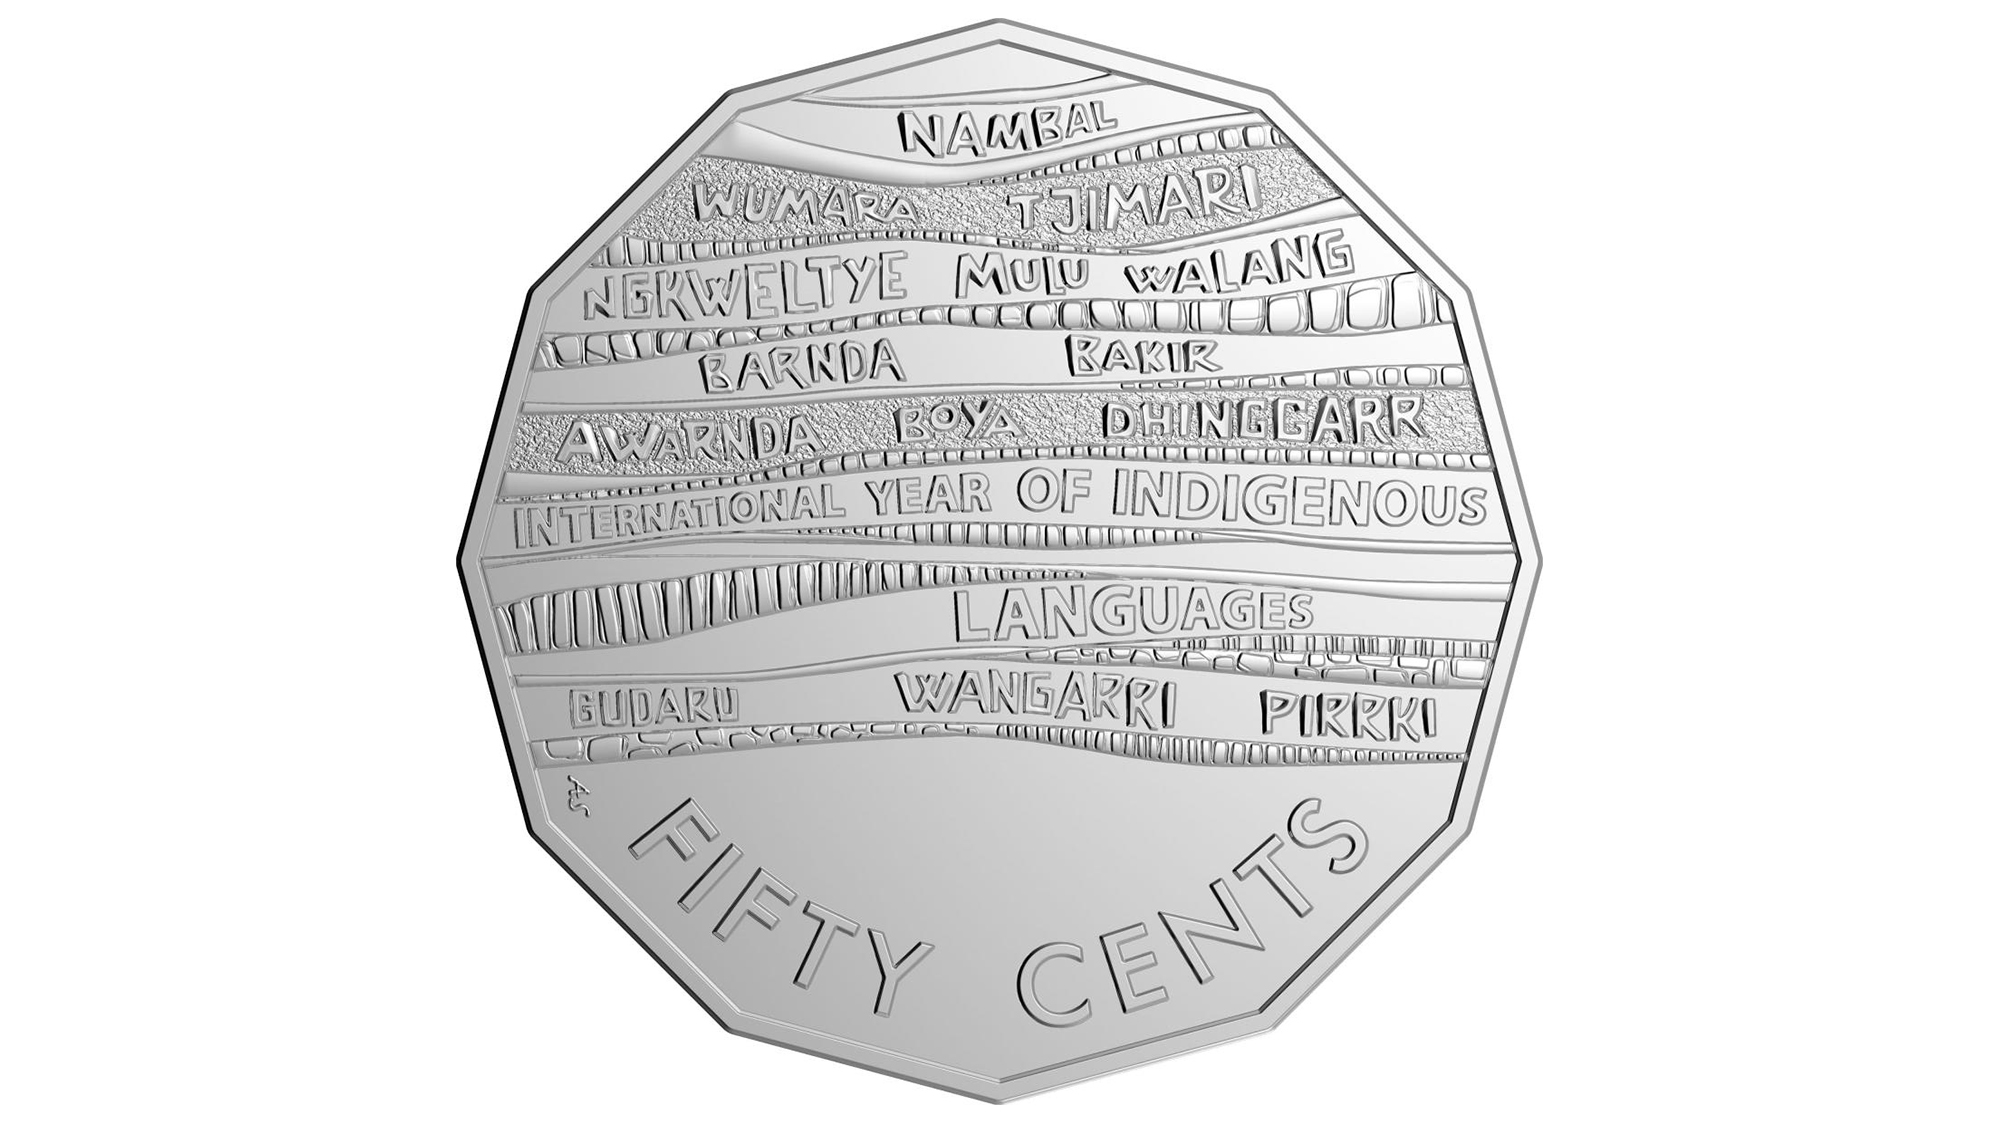 New Australian 50 Cent Coin Features 14 Indigenous Languages Cnn